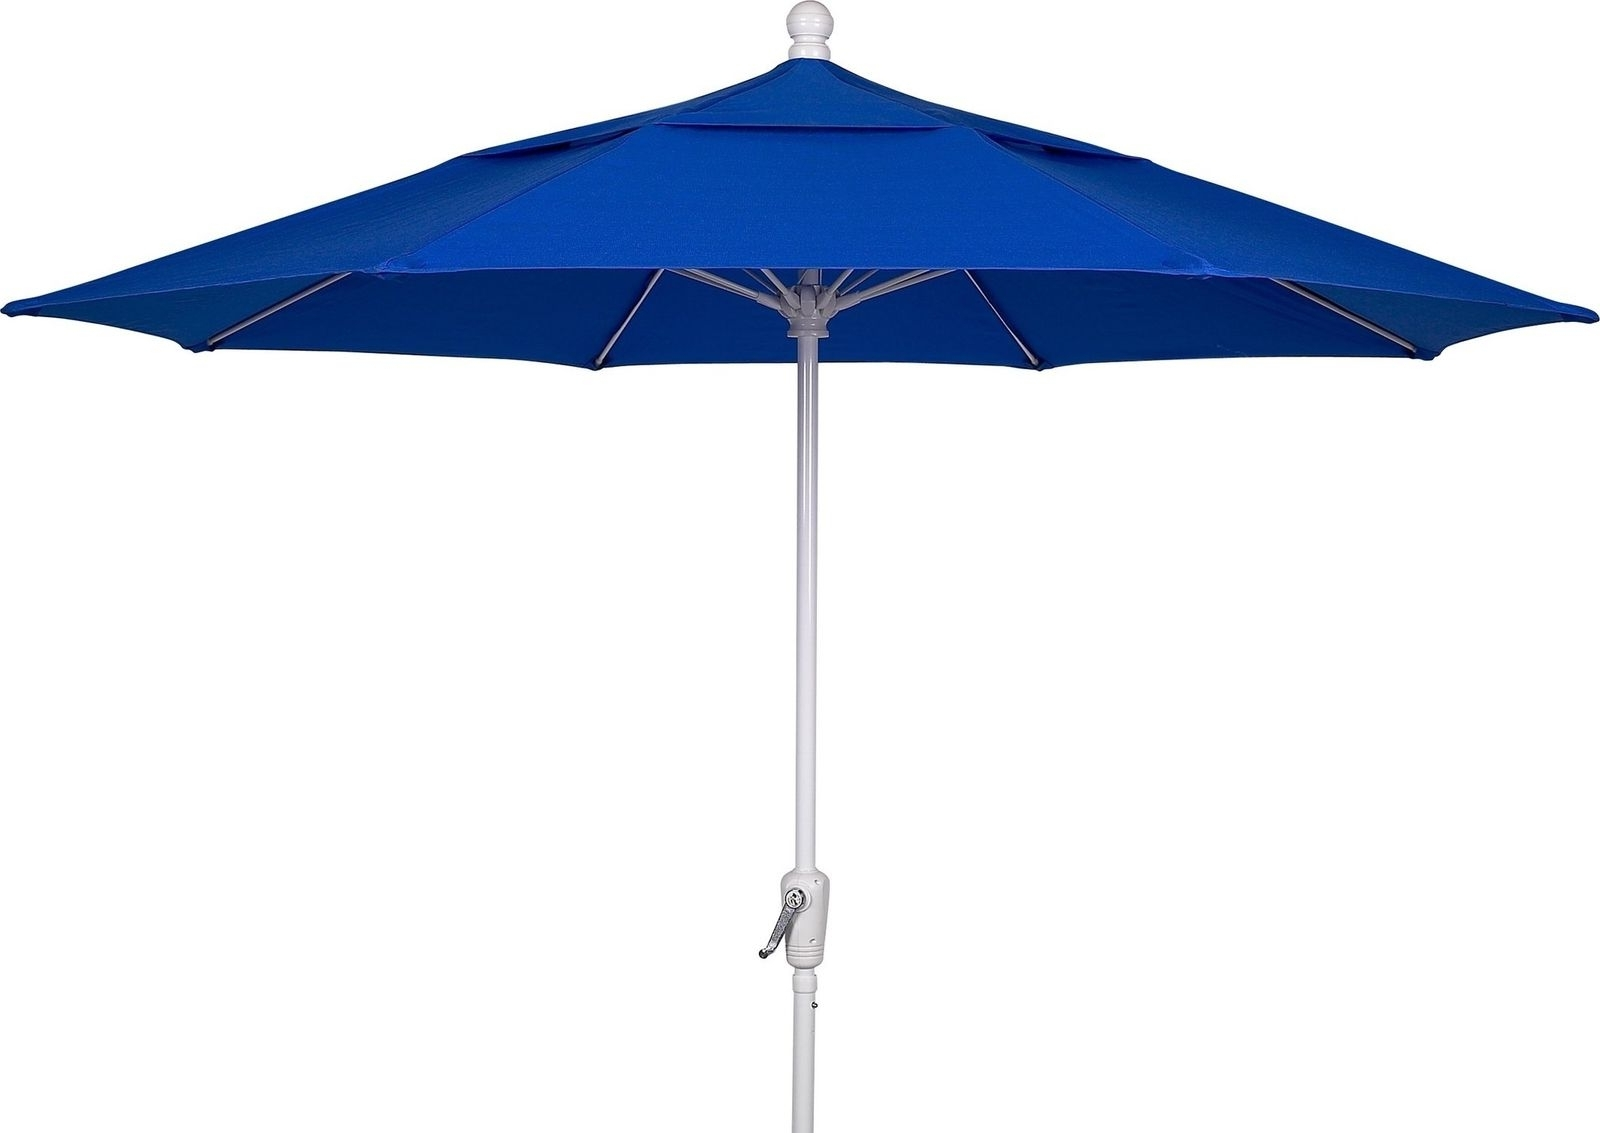 Most Recently Released Fiberbuilt Umbrellas Patio Umbrella  (View 8 of 20)